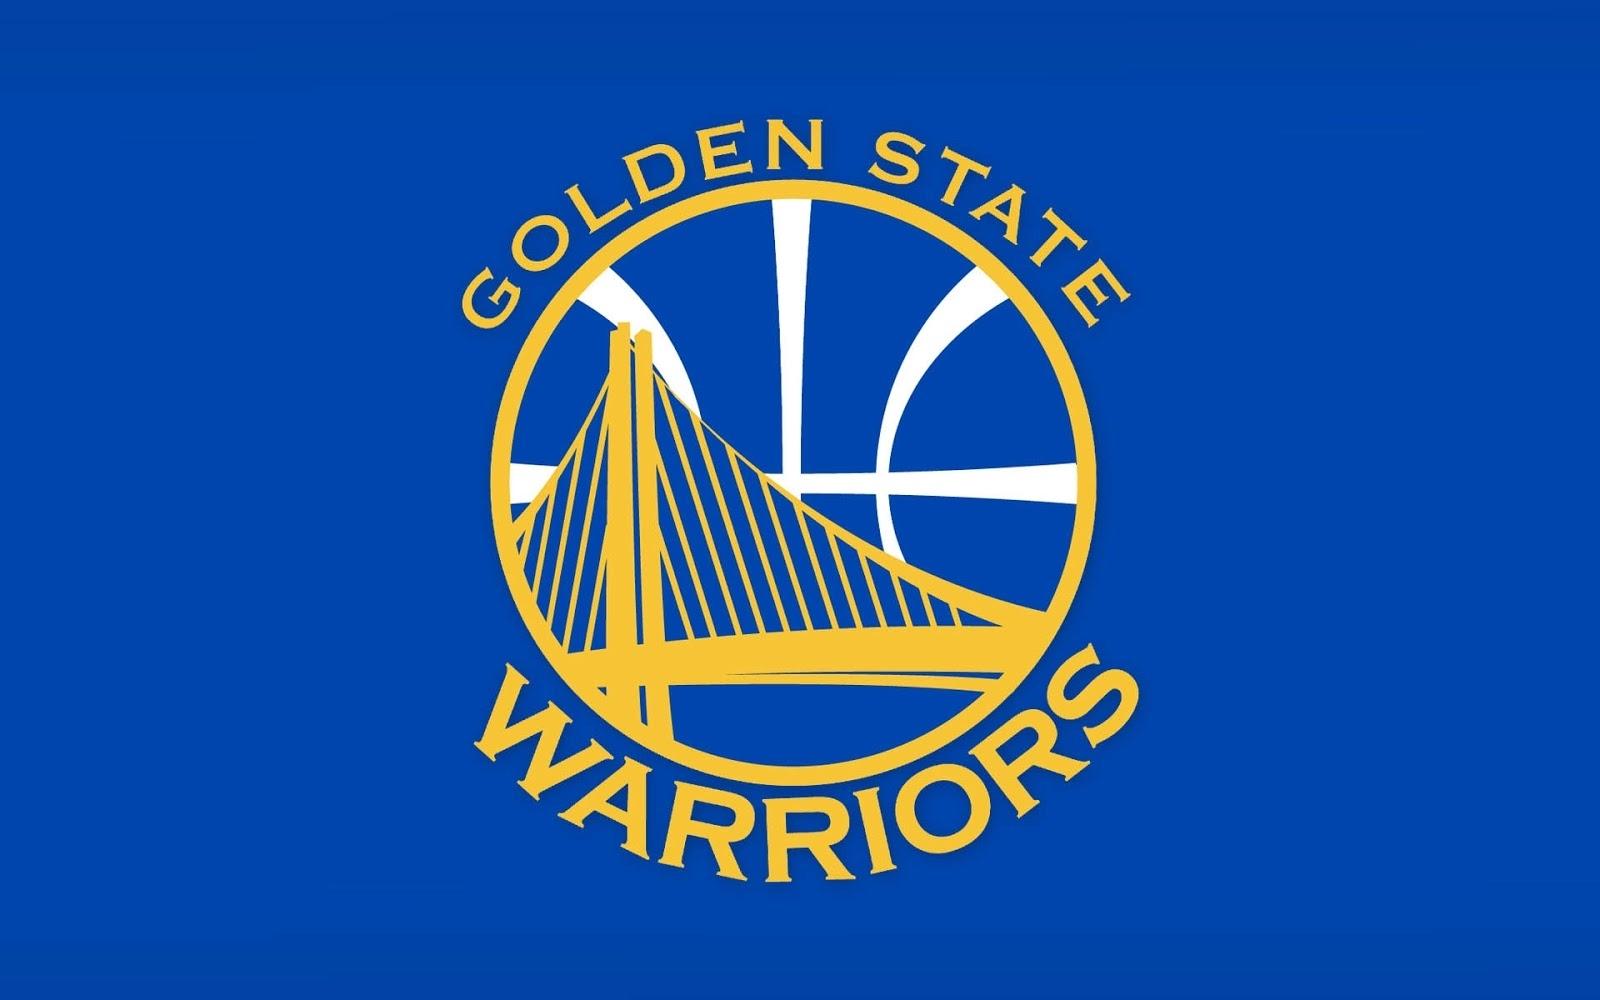 golden state warriors logo -logo brands for free hd 3d